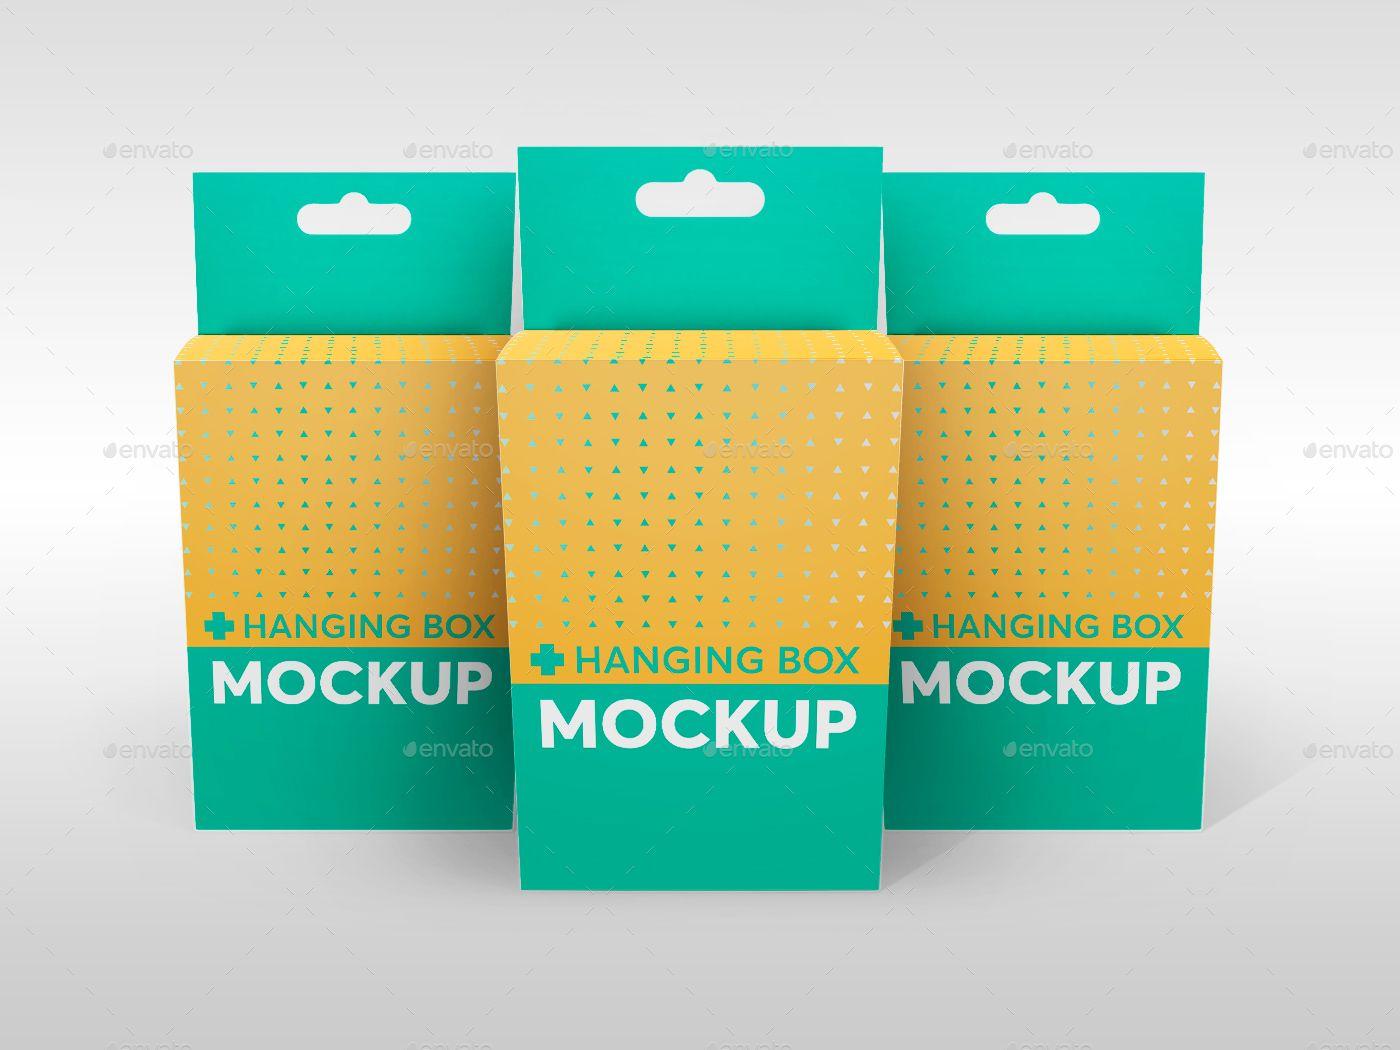 Download Hanging Box Mockup V 1 Hanging Box Mockup Box Mockup Box Packaging Design Branding Design Inspiration